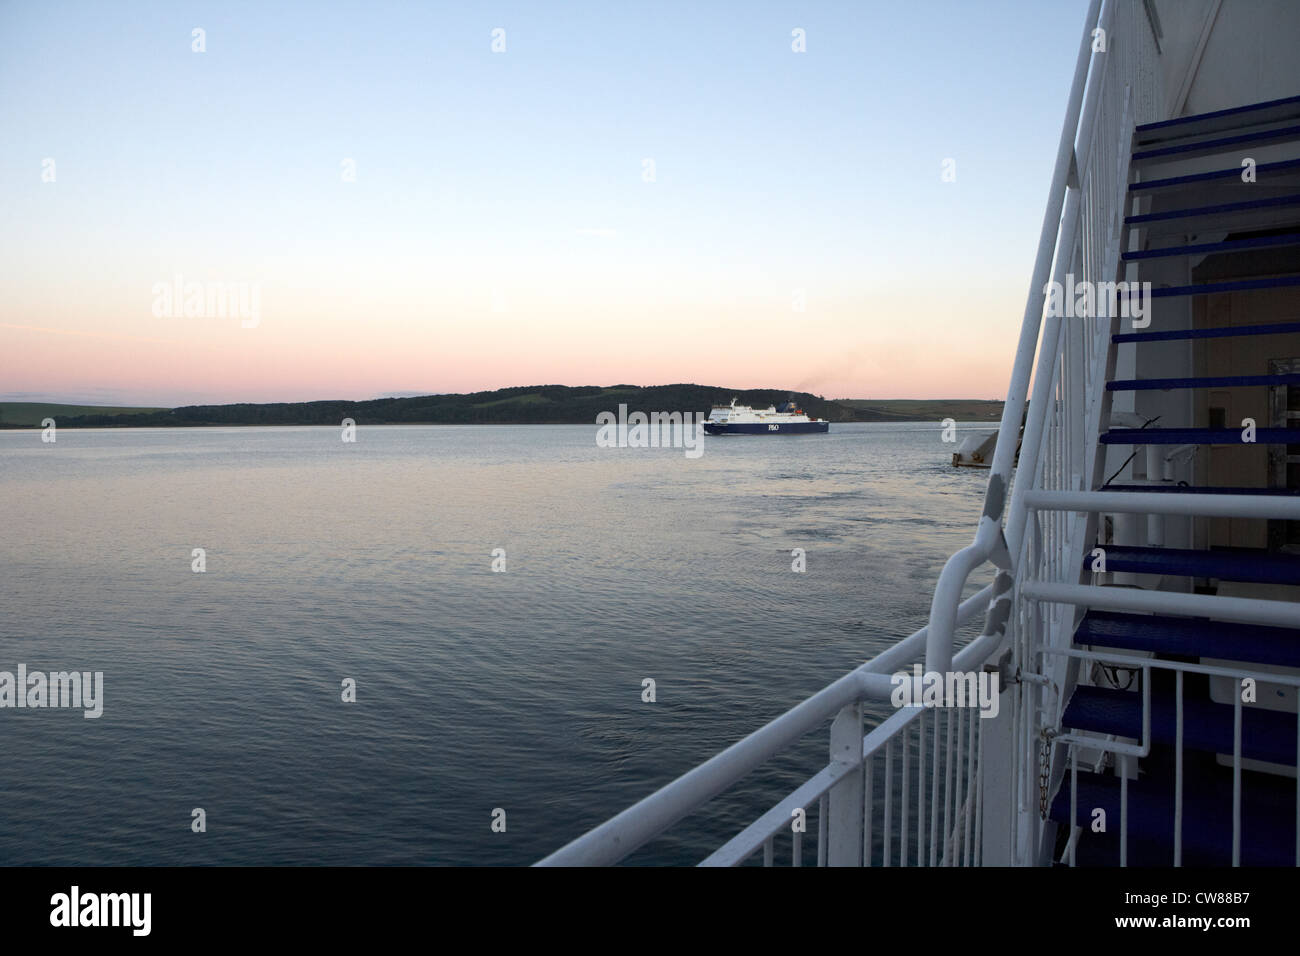 p&o irish sea ferry mv european causeway in loch ryan viewed from stena line superfast scotland uk united kingdom Stock Photo